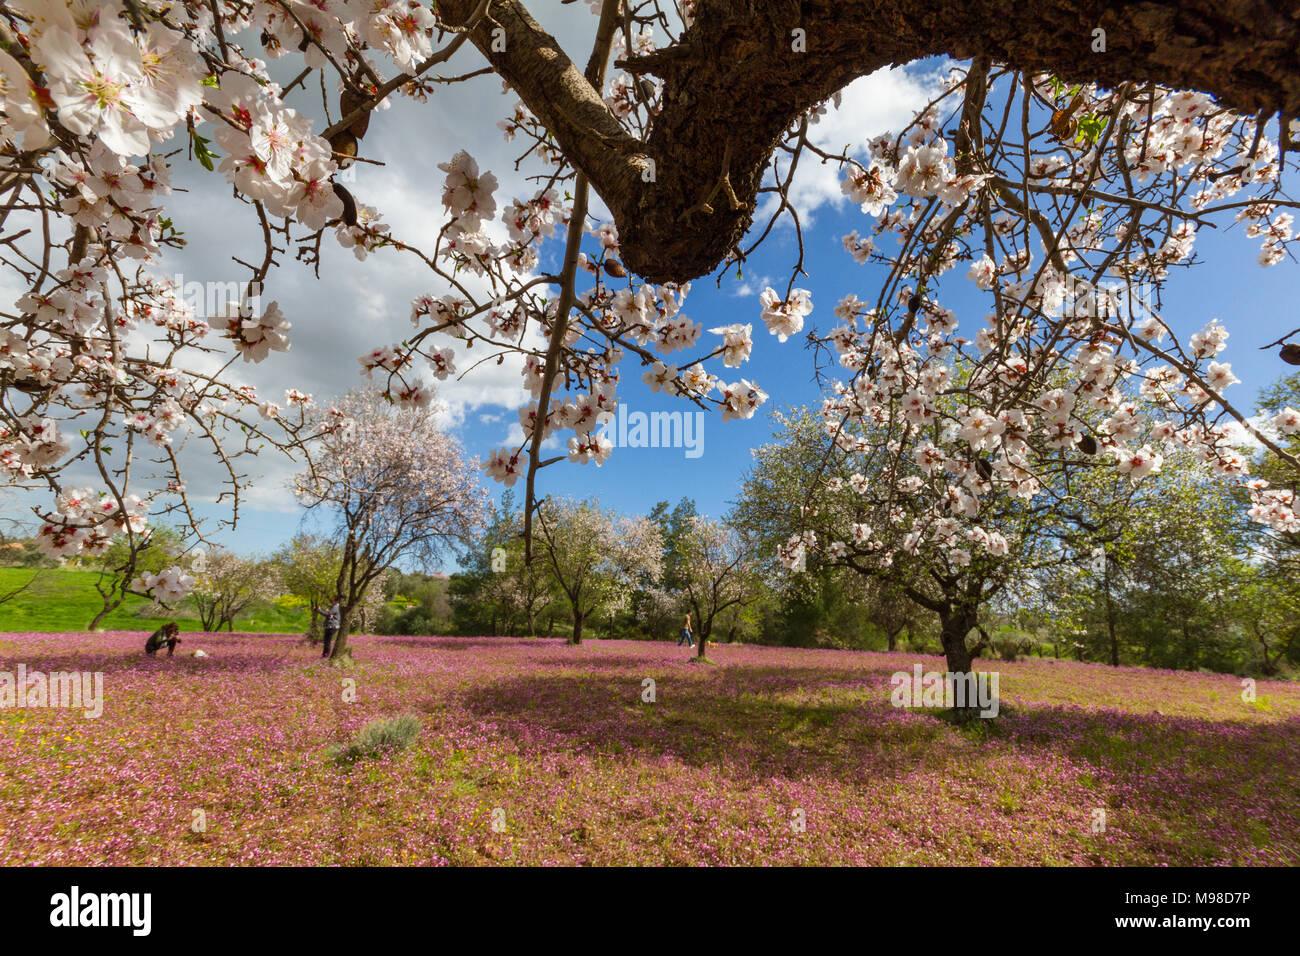 Klirou Cyprus February 28 2018 Field Of Blossoming Almond Trees